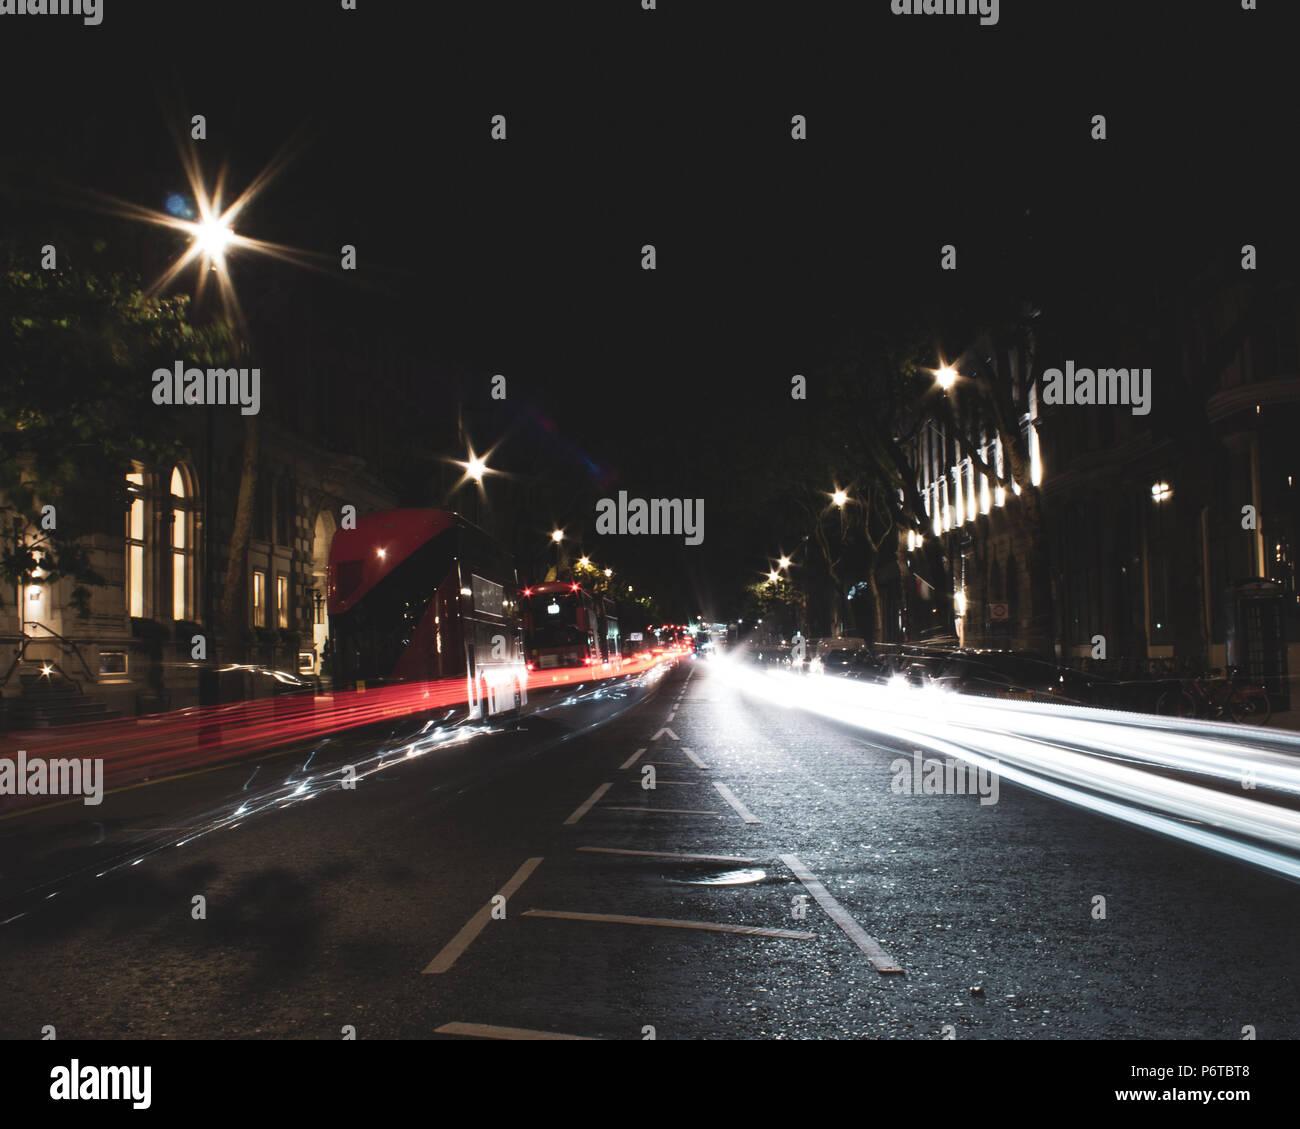 Road Light Trails - Stock Image